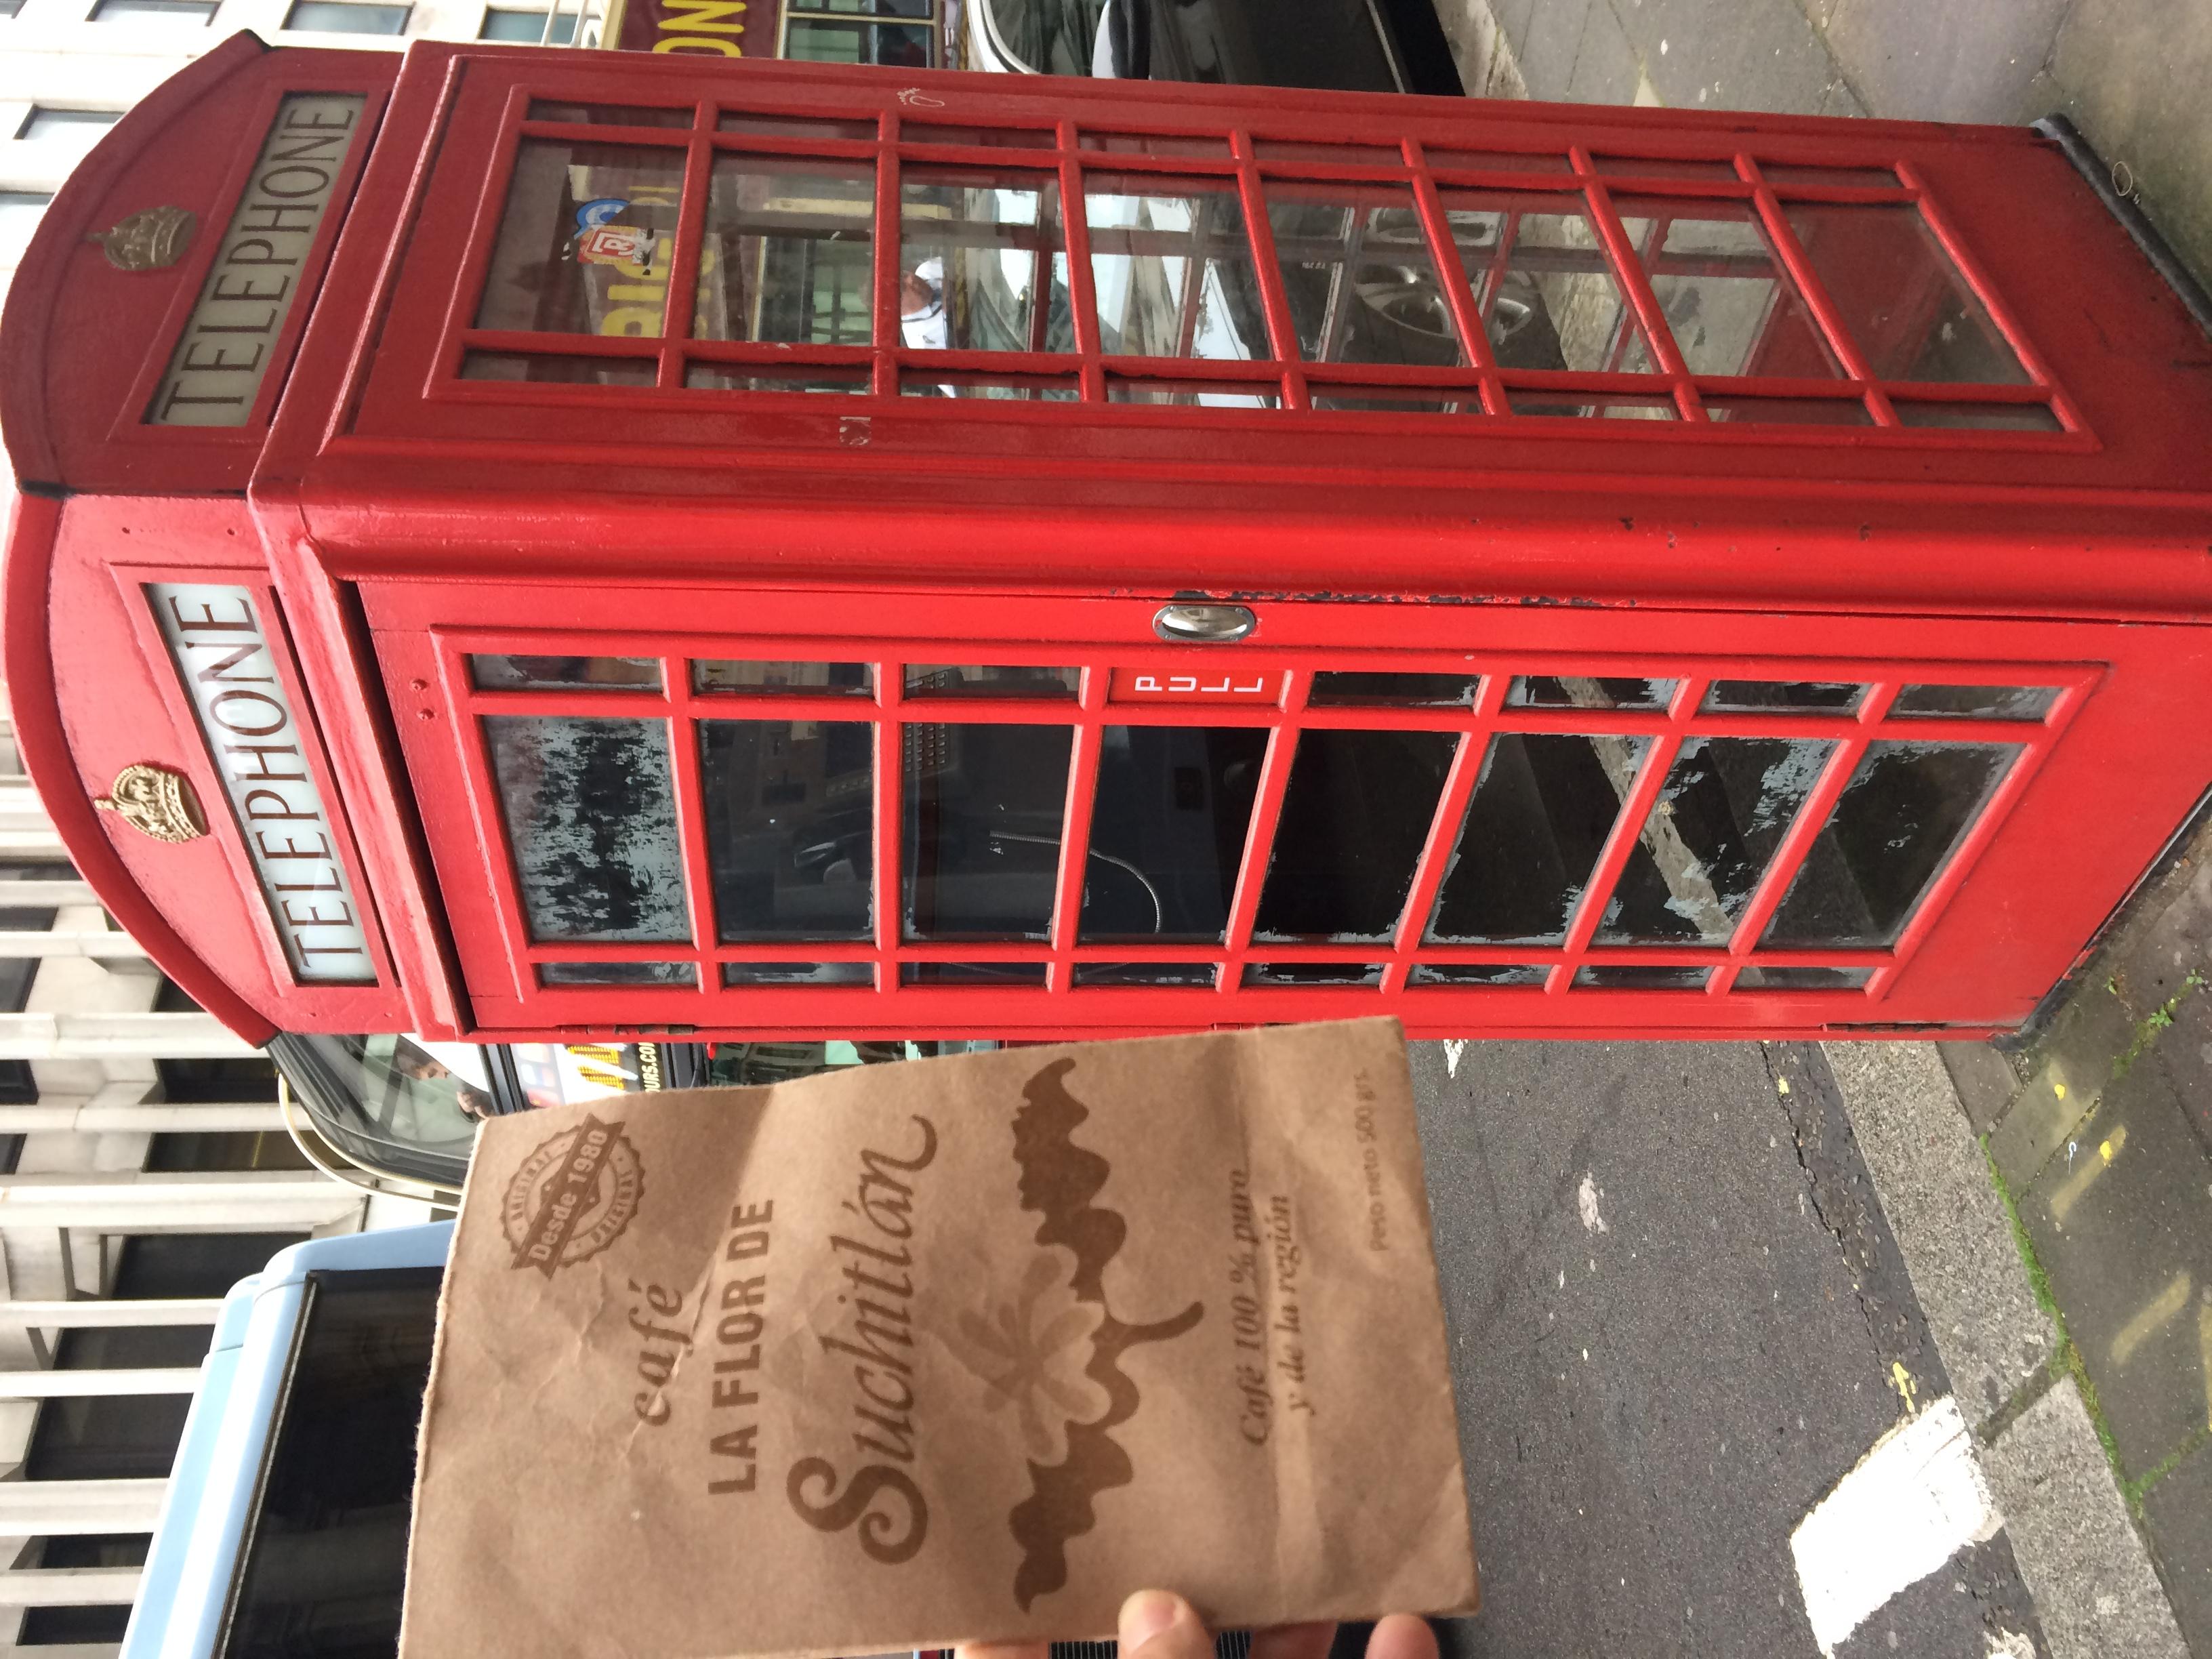 La roja cabina telefónica